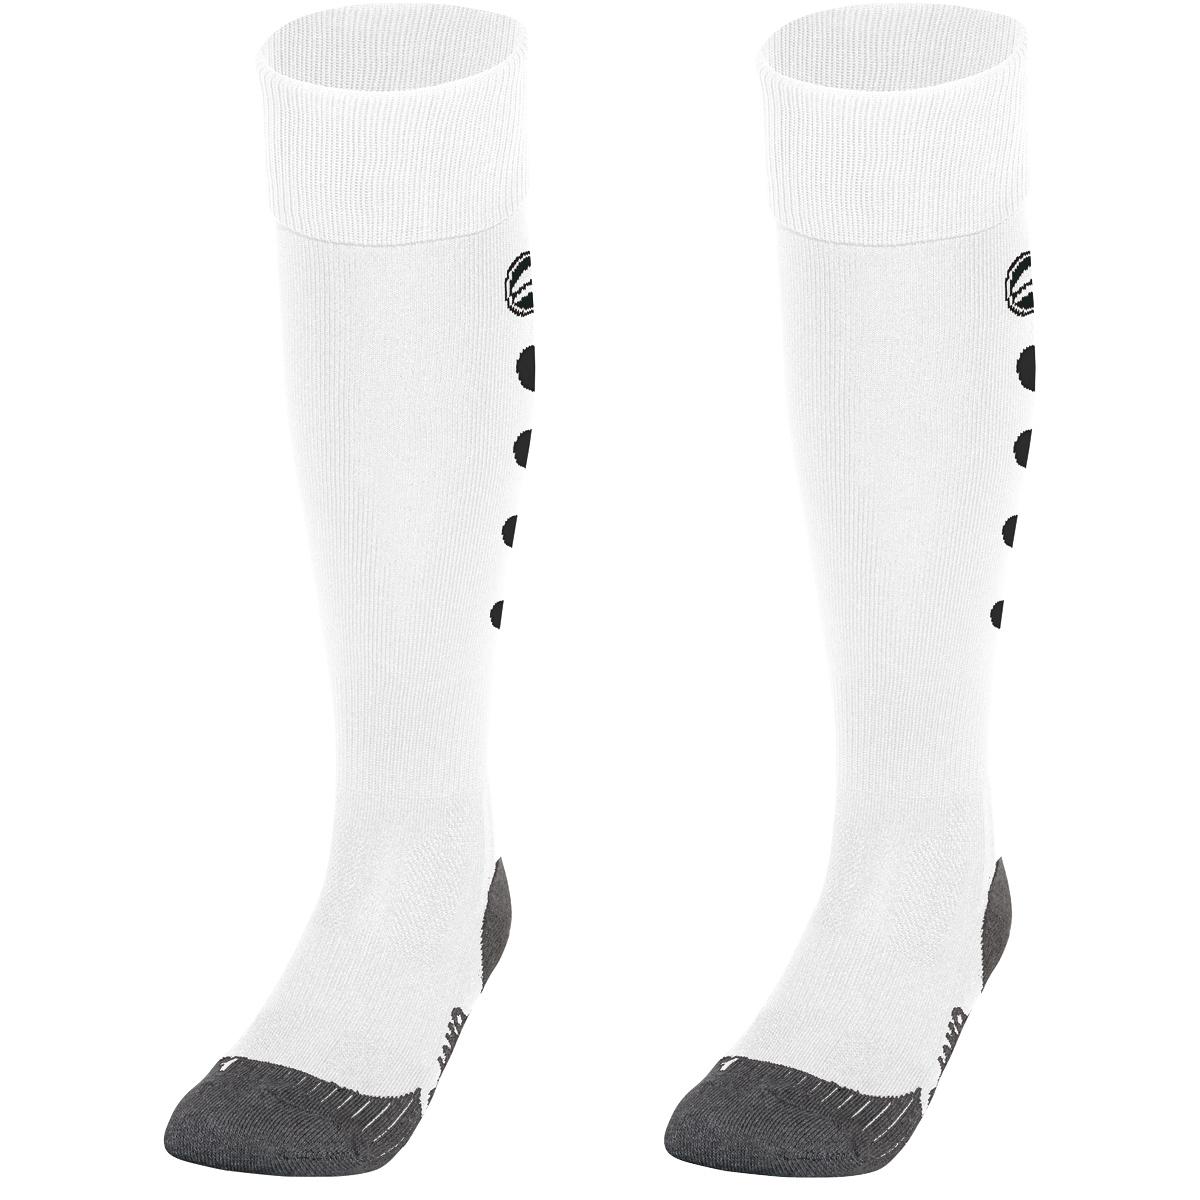 Jako Stutzenstrumpf ROMA  Fußball Sockenstutzen Fußballstrümpfe Socken 3808